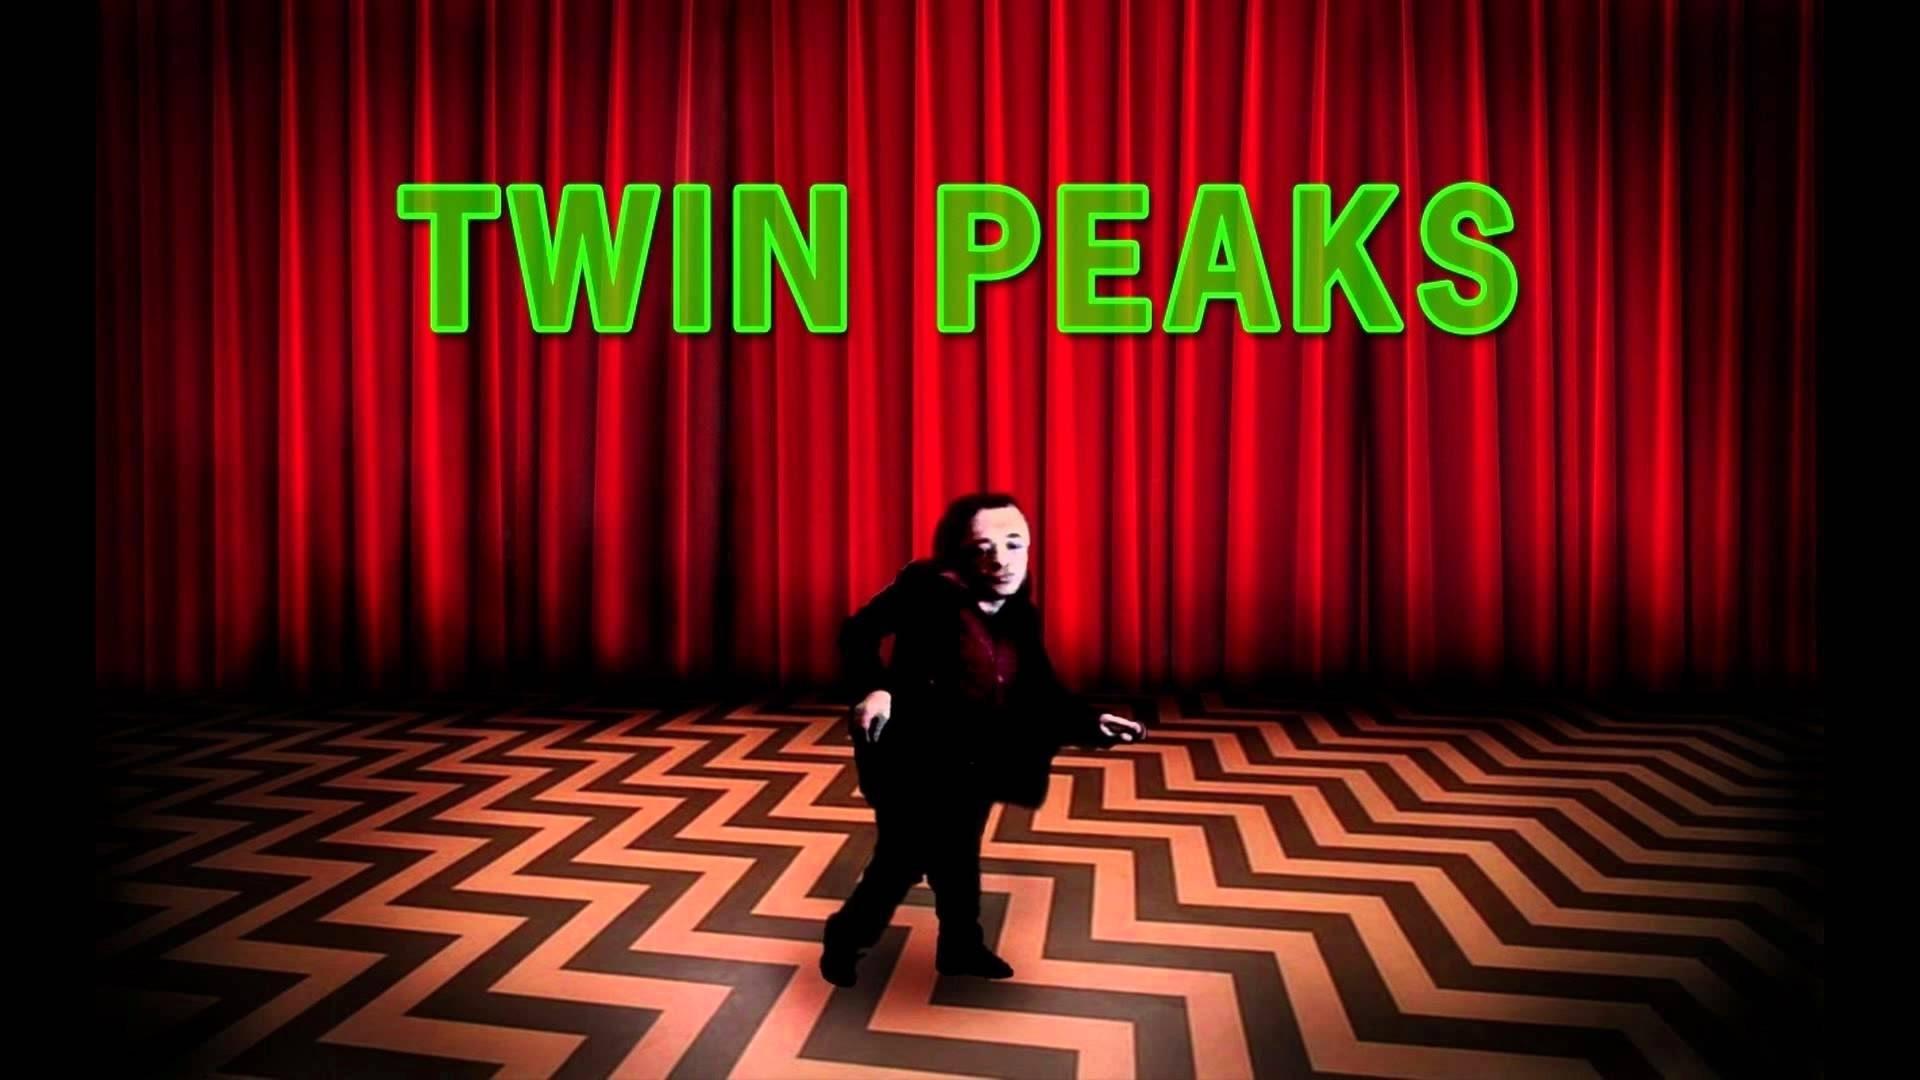 TWIN PEAKS crime drama series mystery fbi 1peaks horror poster wallpaper |  | 939278 | WallpaperUP